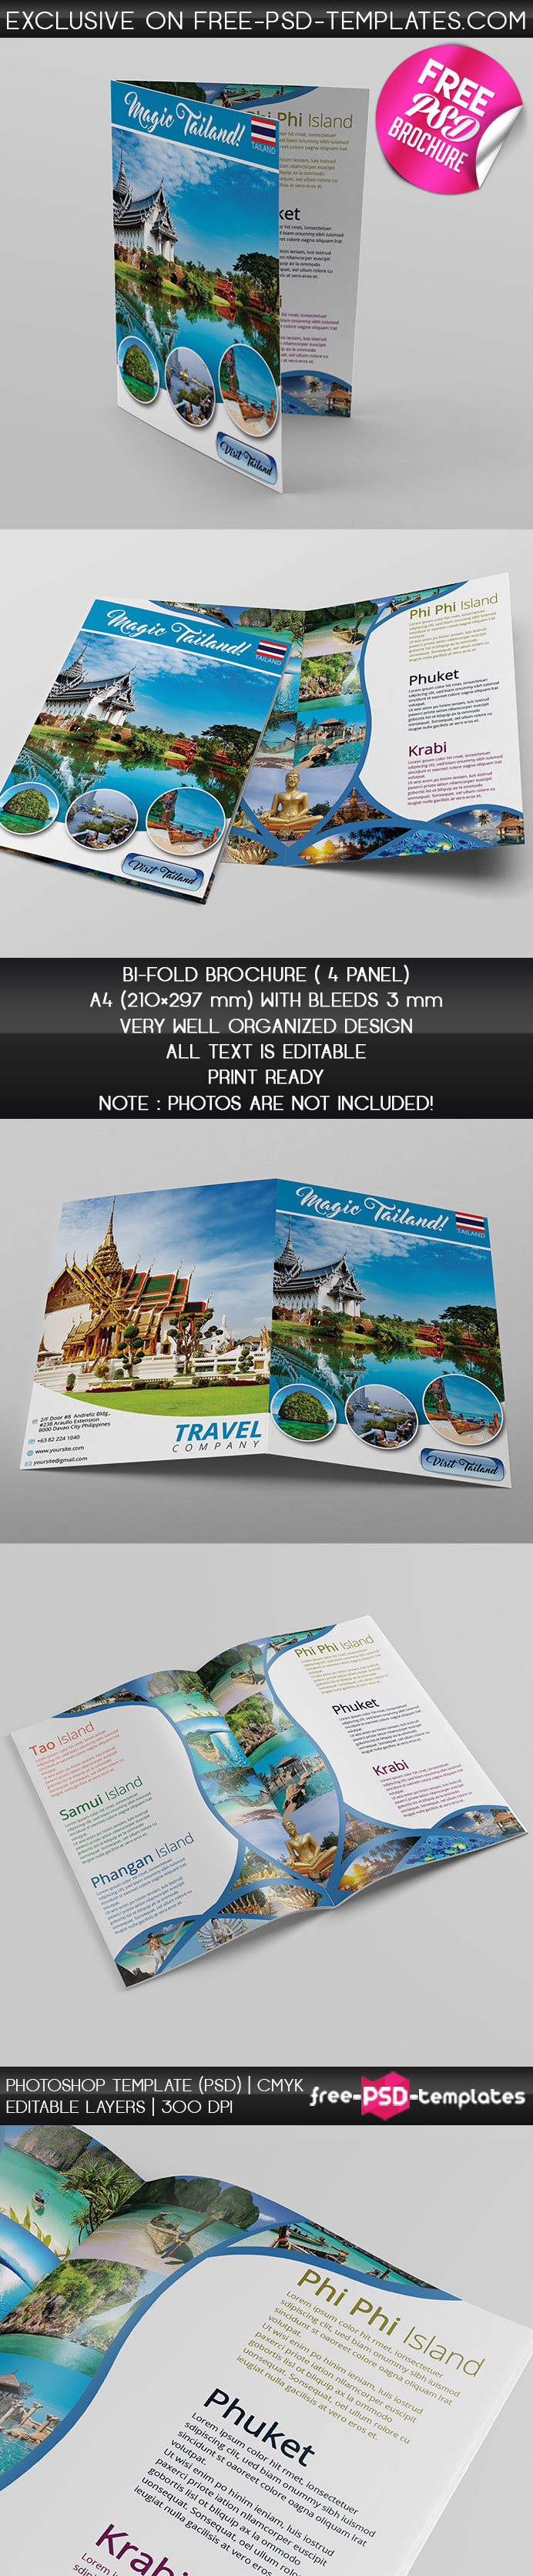 Touristic Bi-Fold Brochure – Free PSD Brochure Template | Free PSD ...